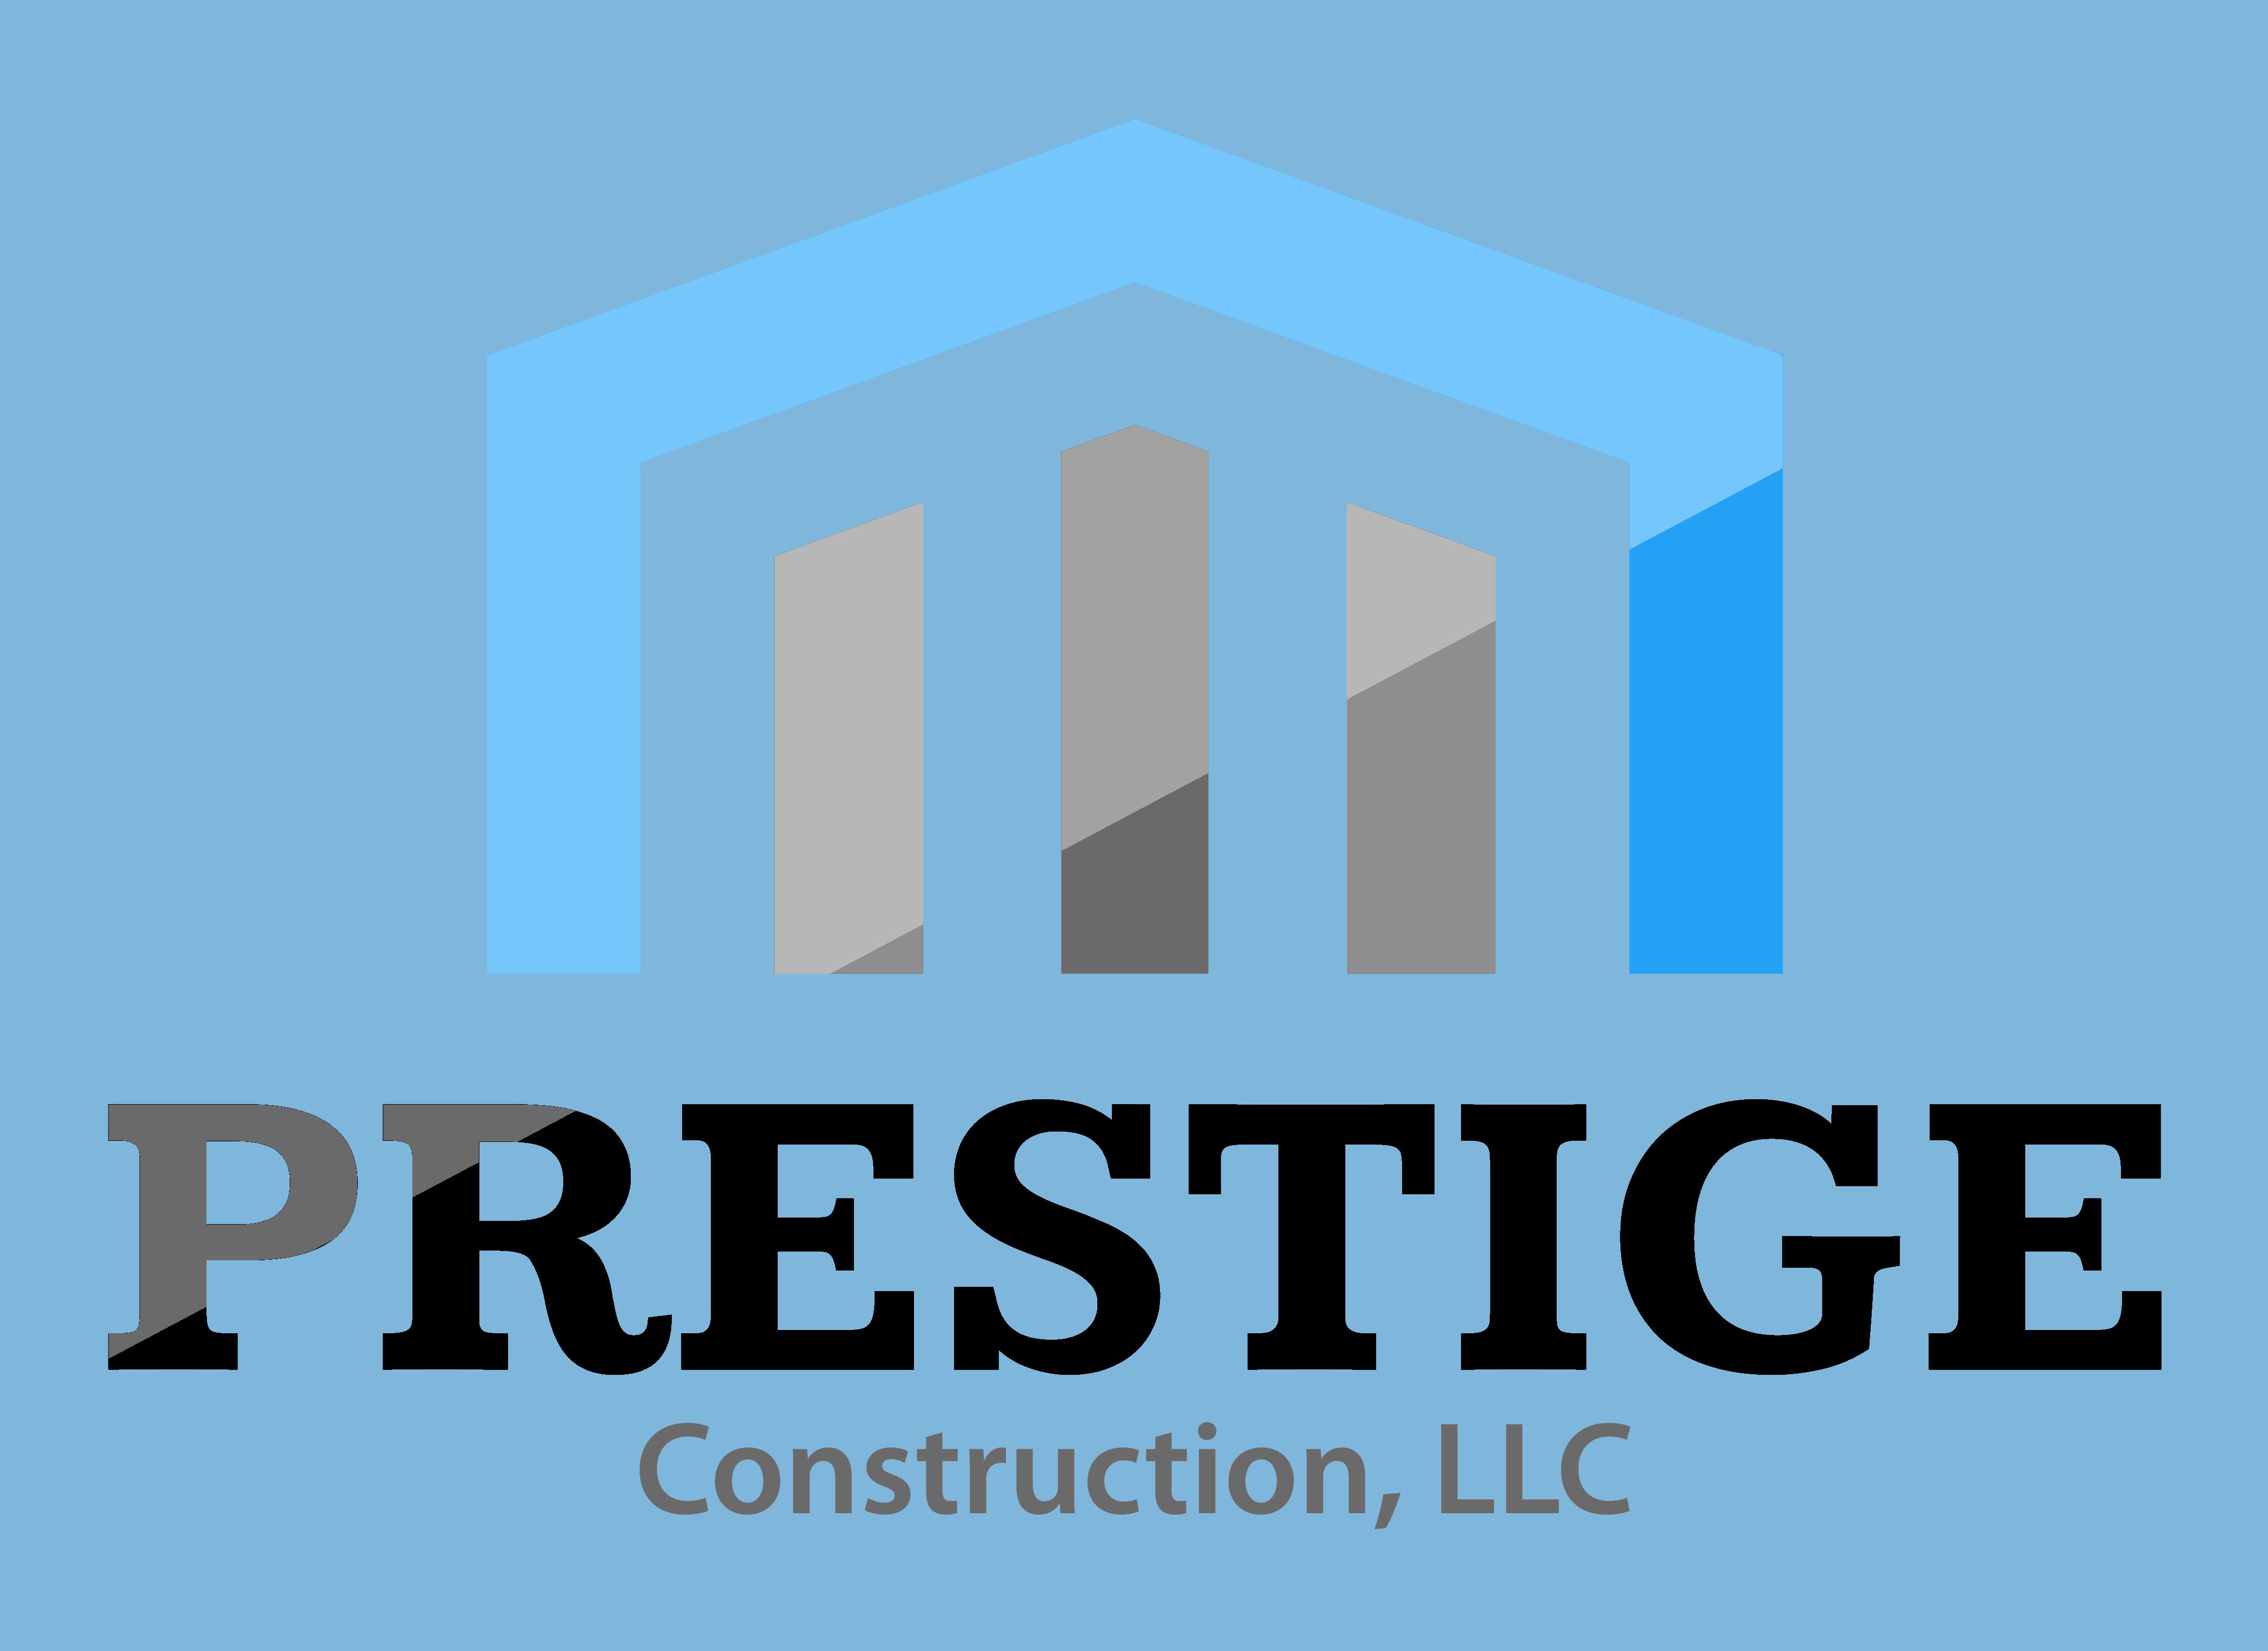 Prestige Construction LLC logo